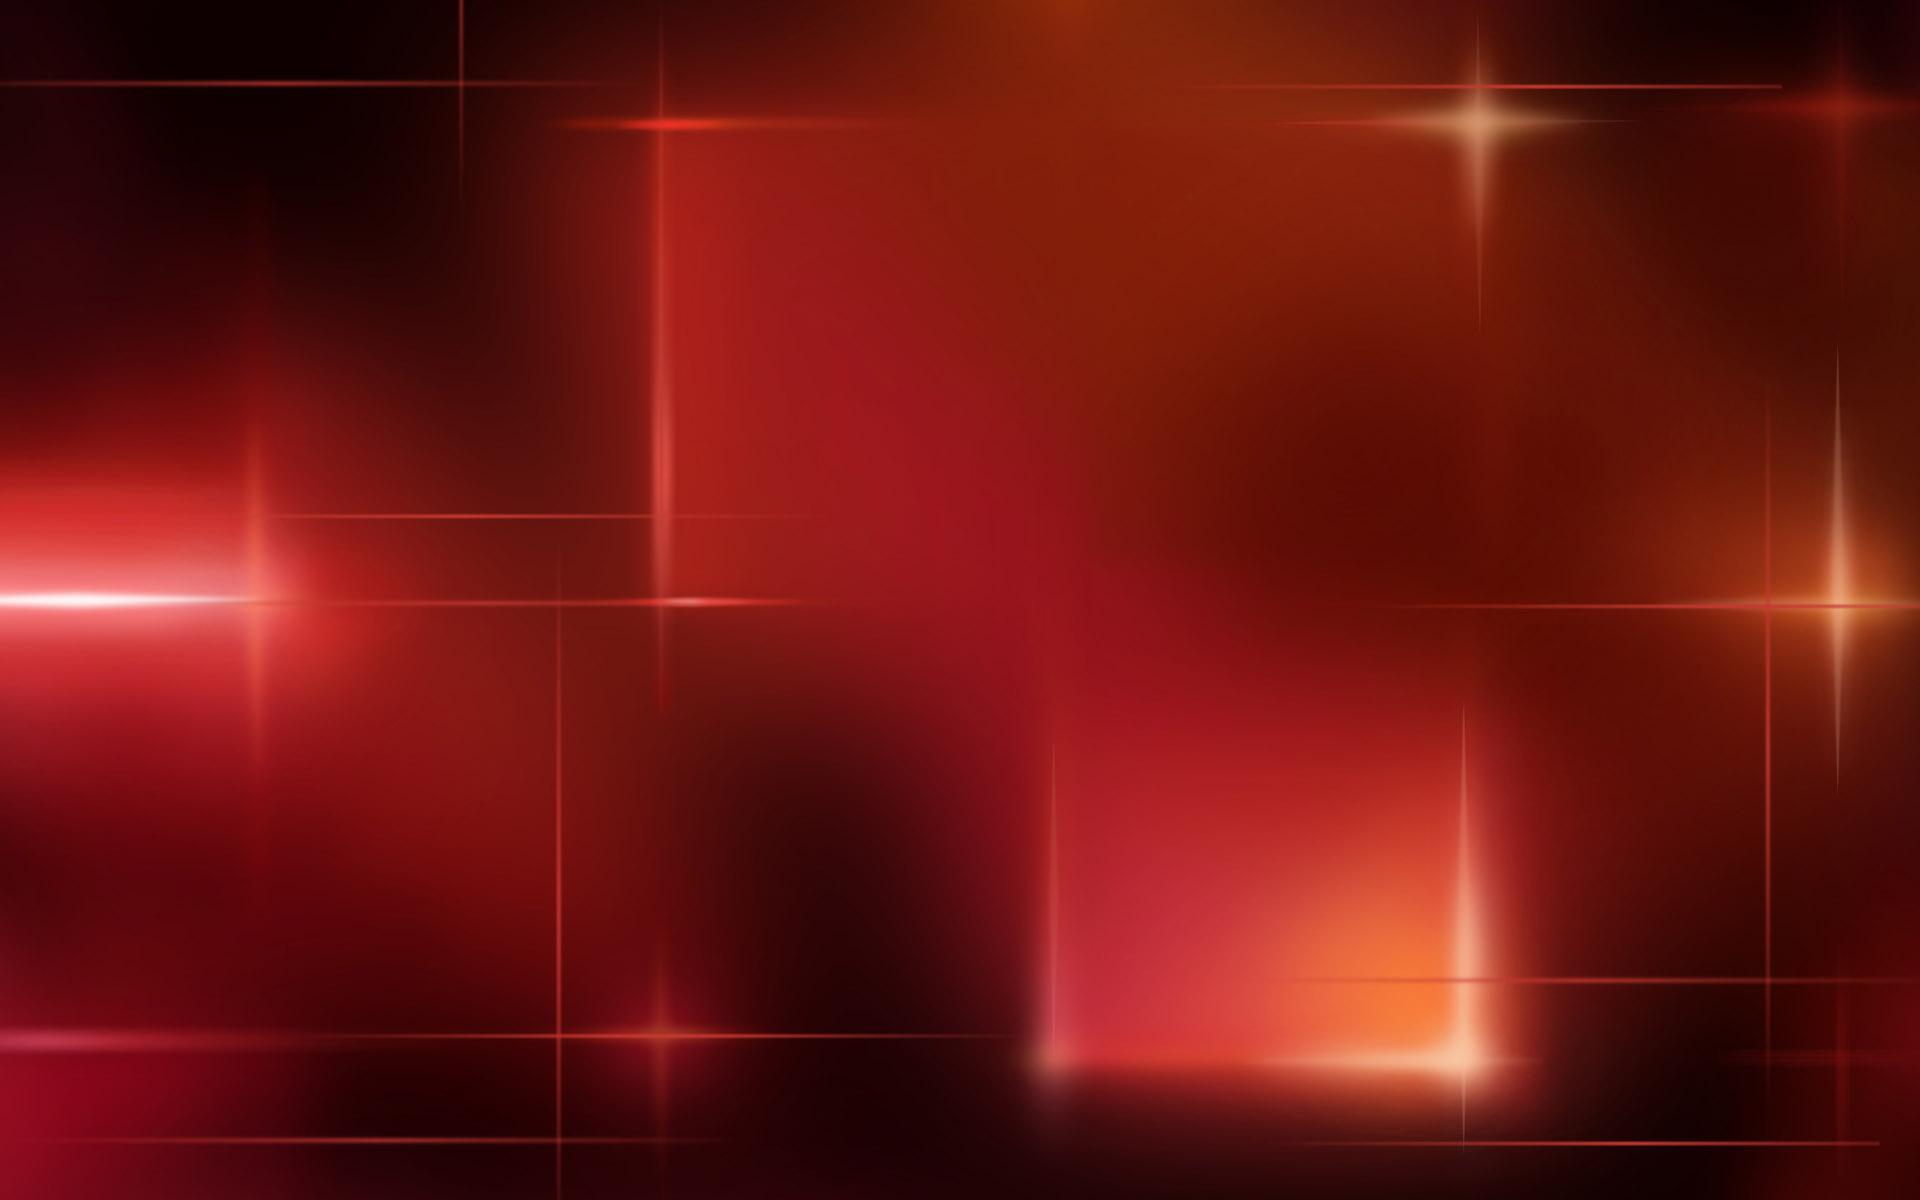 3d Colours Wallpaper Heart Red Wallpaper Hd Wallpapers Pulse